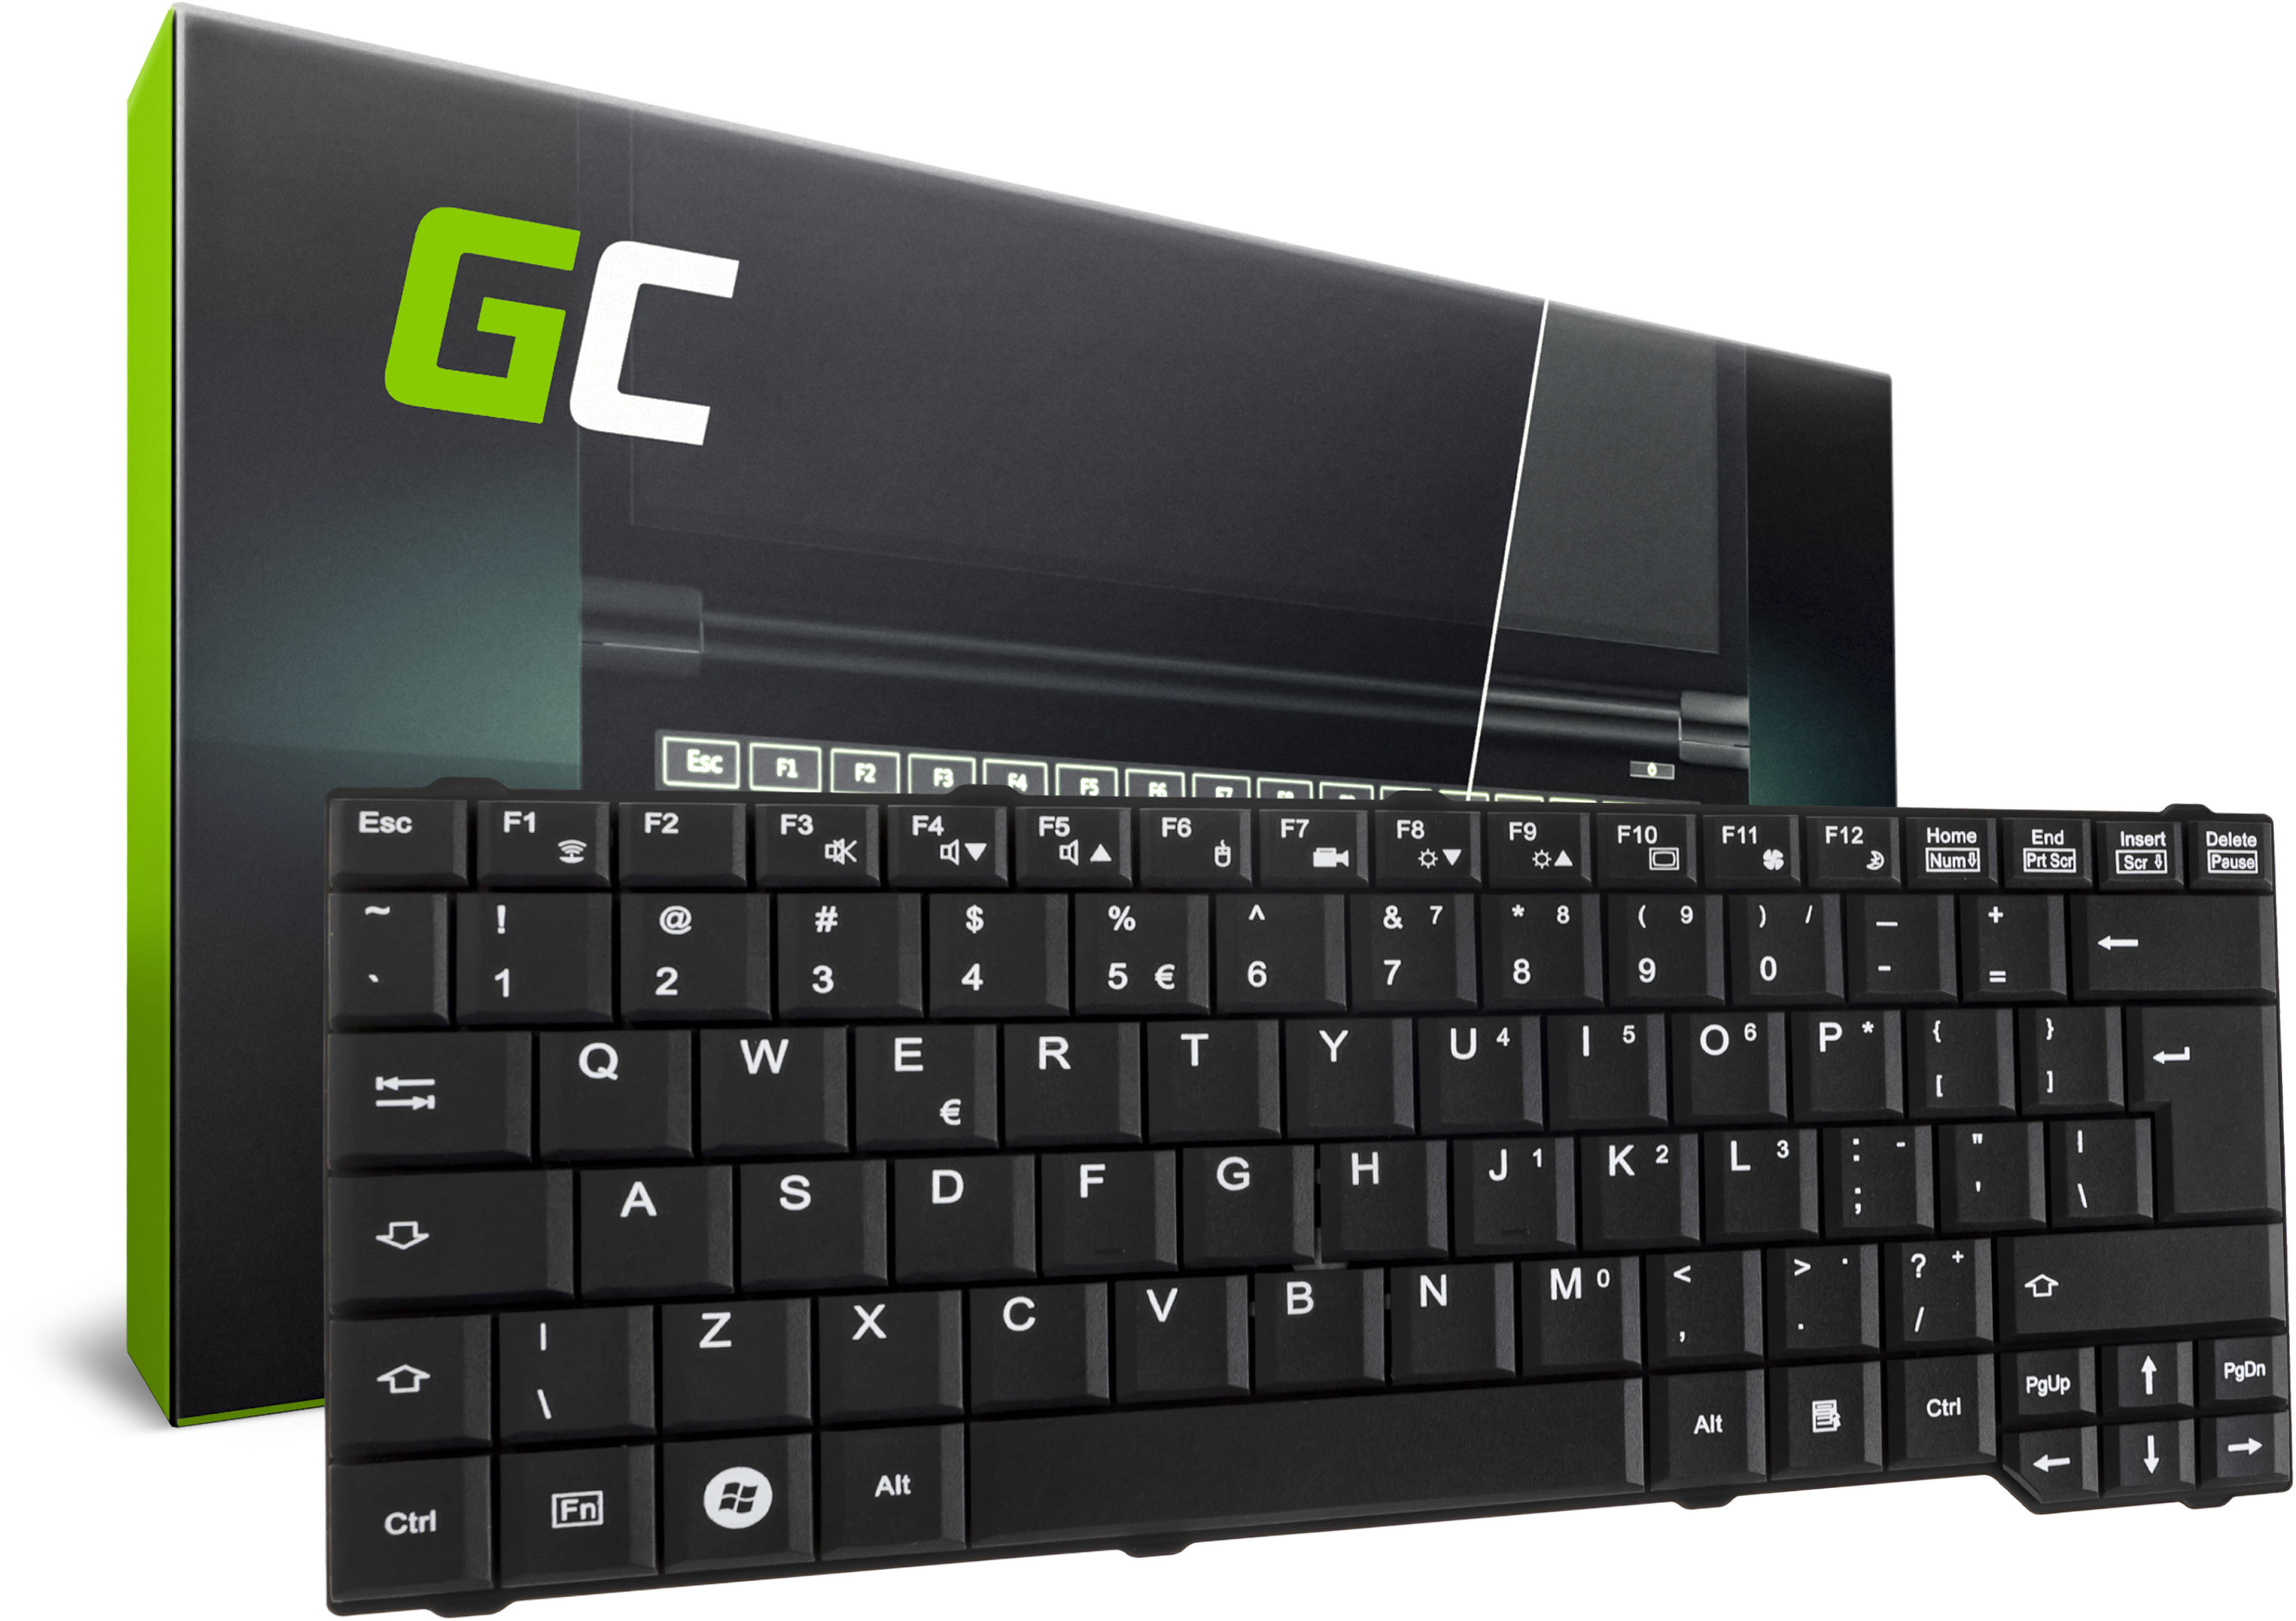 Klawiatura do Laptopa Fujitsu-Siemens Amilo Li3710 Pa3515 Pa3553 Pi3525 Pi3540 Pi3560 Sa3650 Si3655